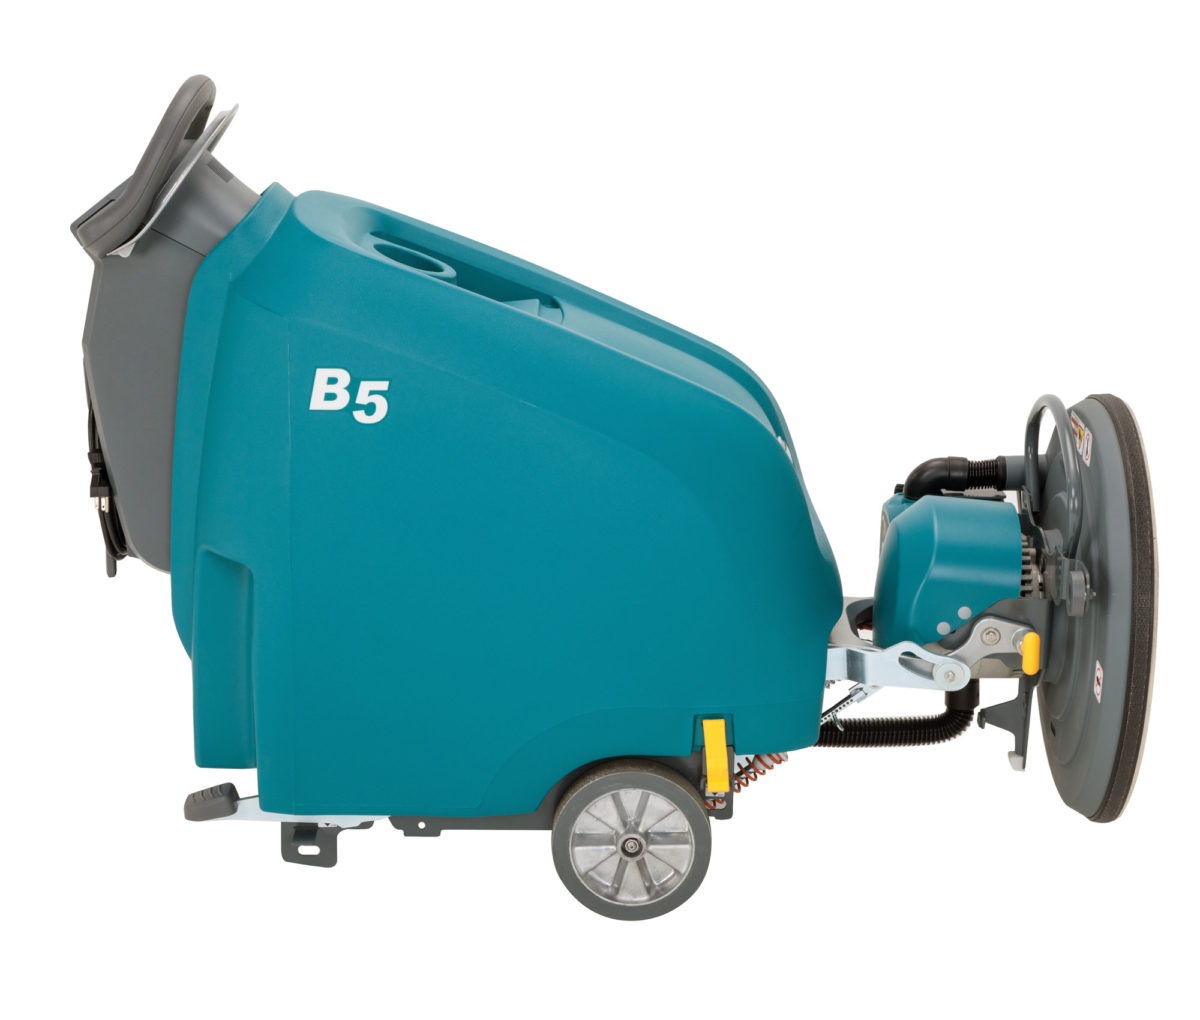 Tennant B5 Battery Burnisher